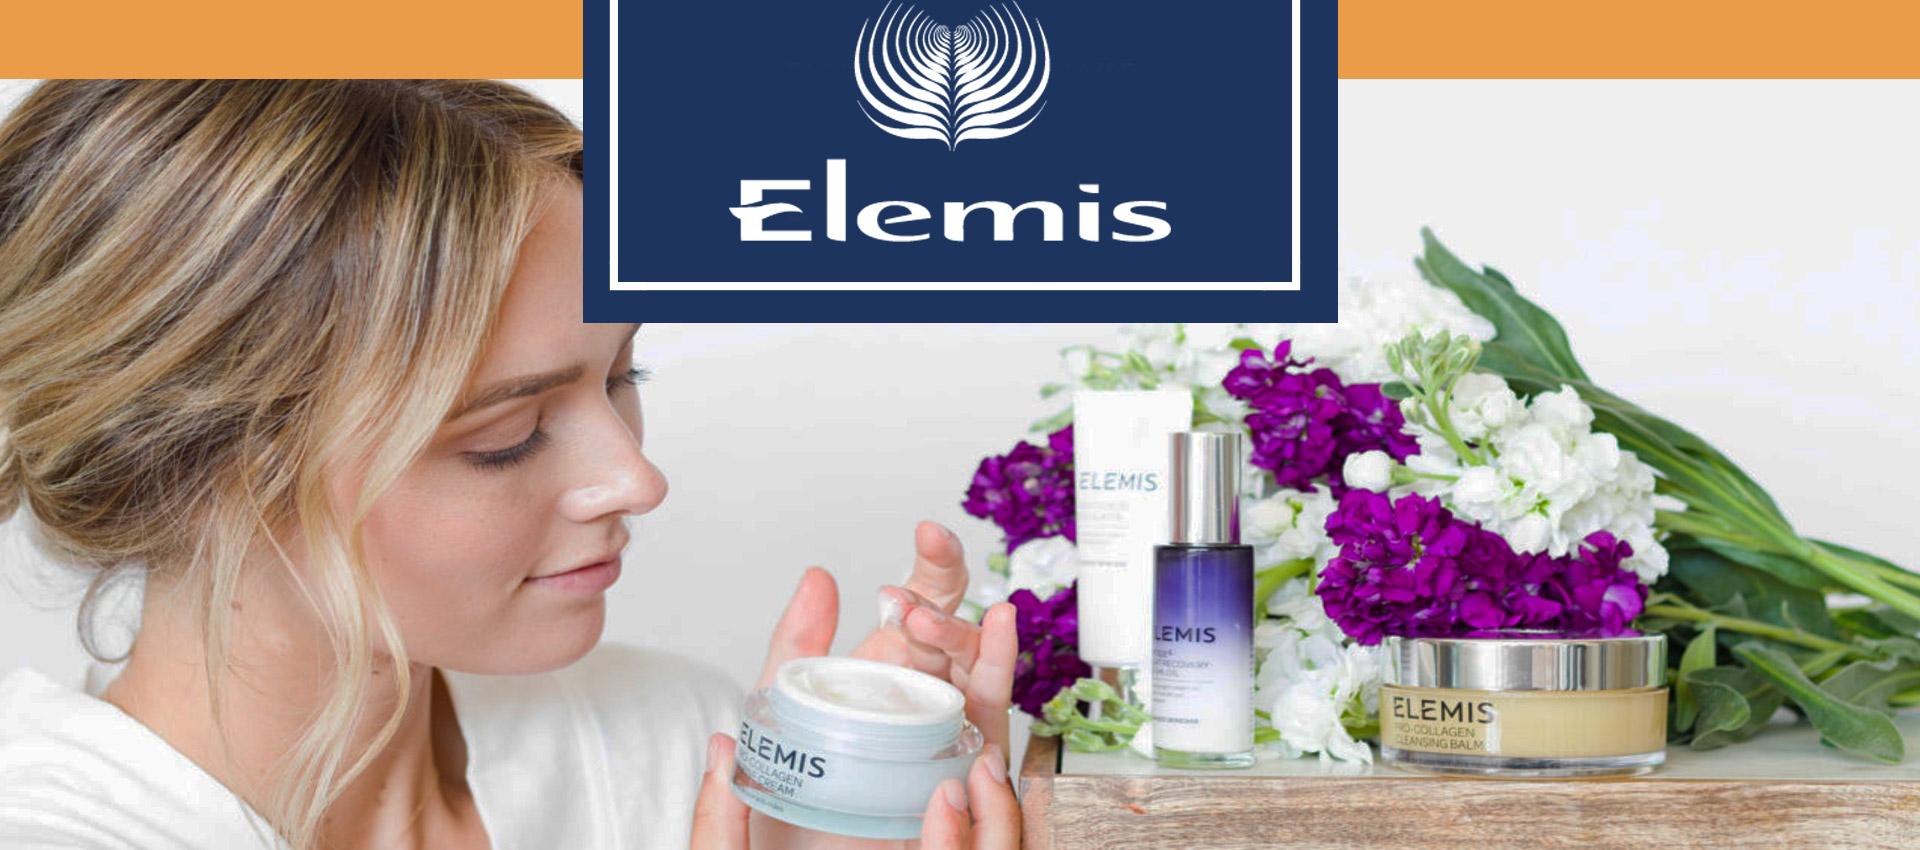 elemis-new-banner.jpg